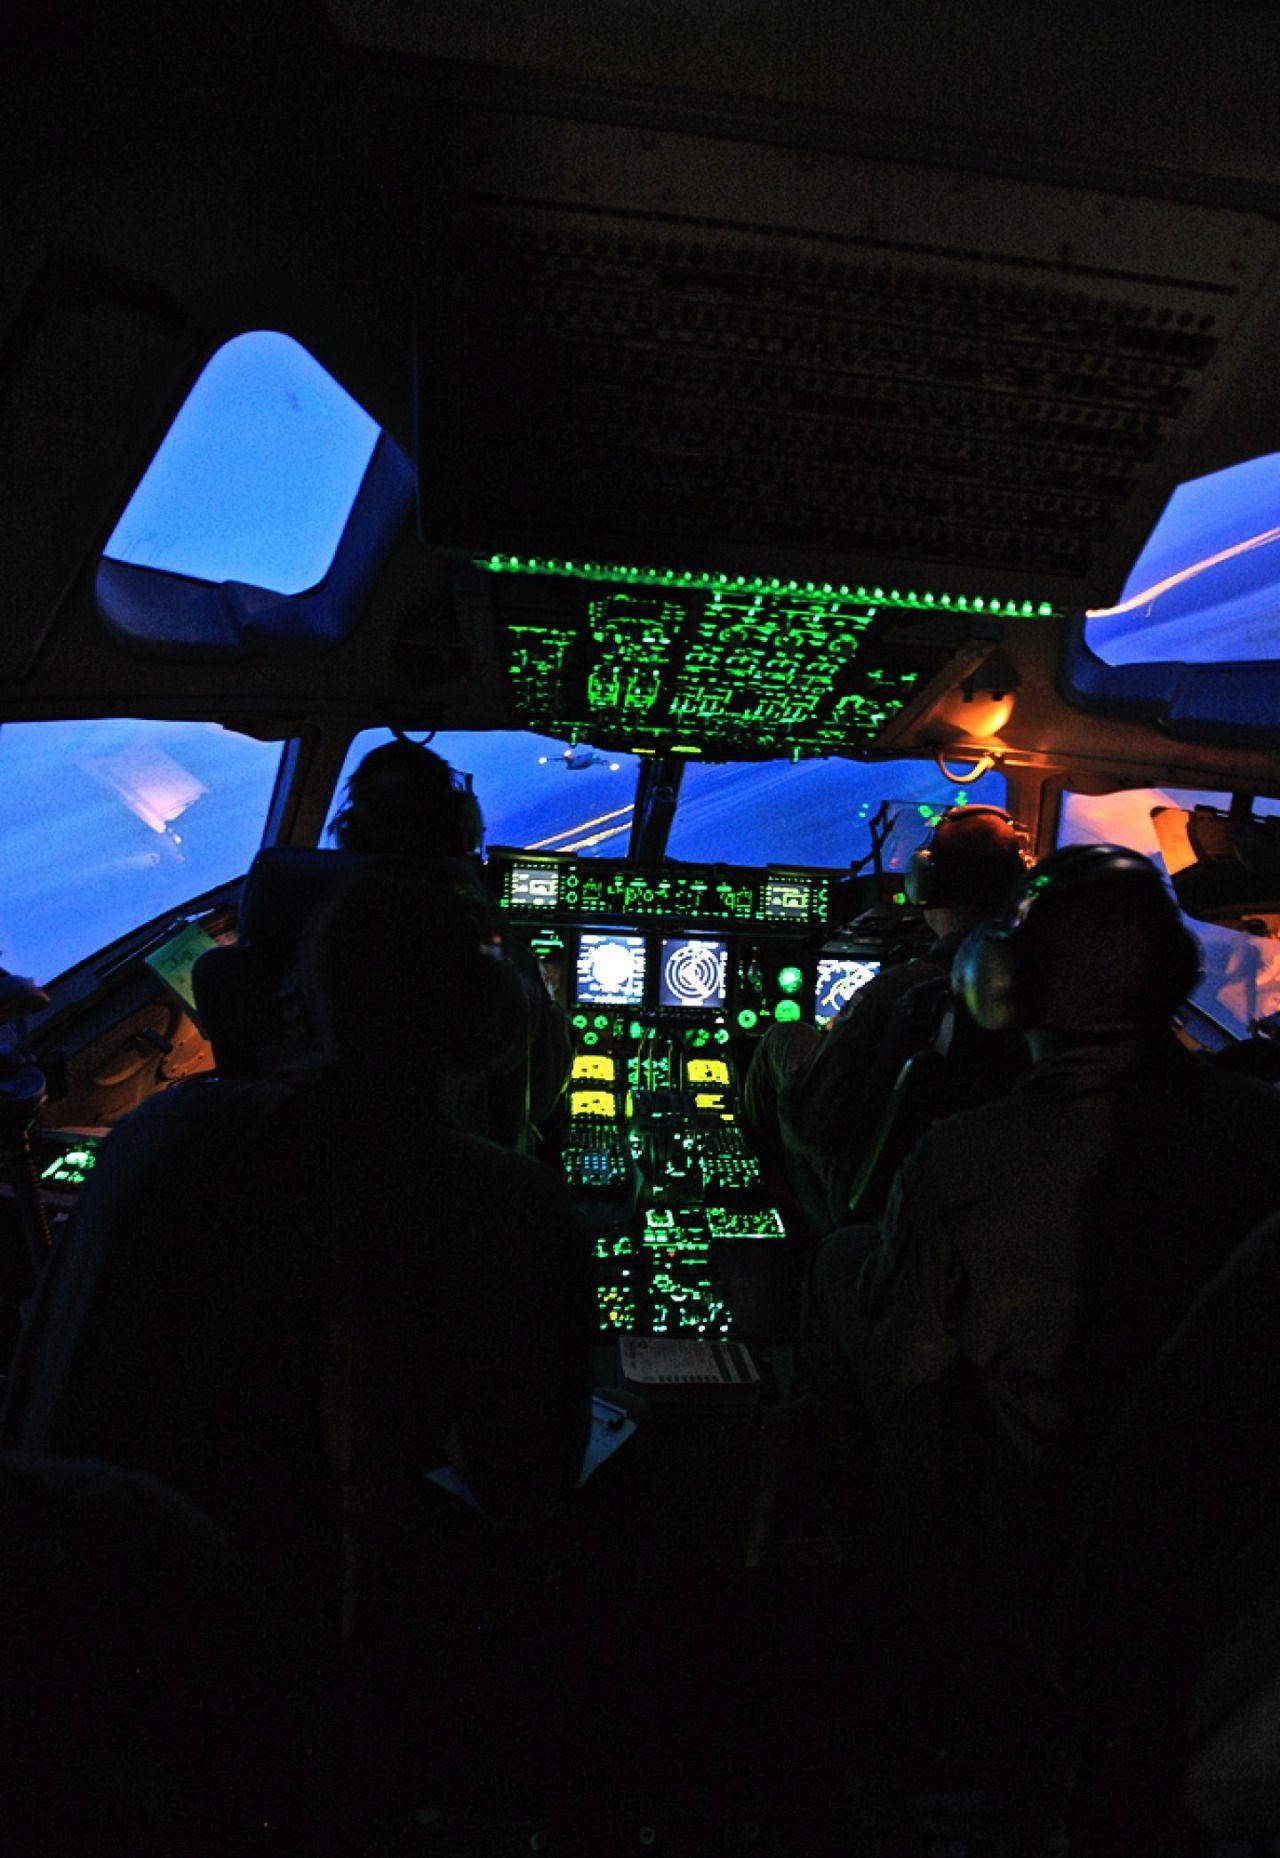 Boeing C17 Globlemaster III cockpit at night. Cockpit